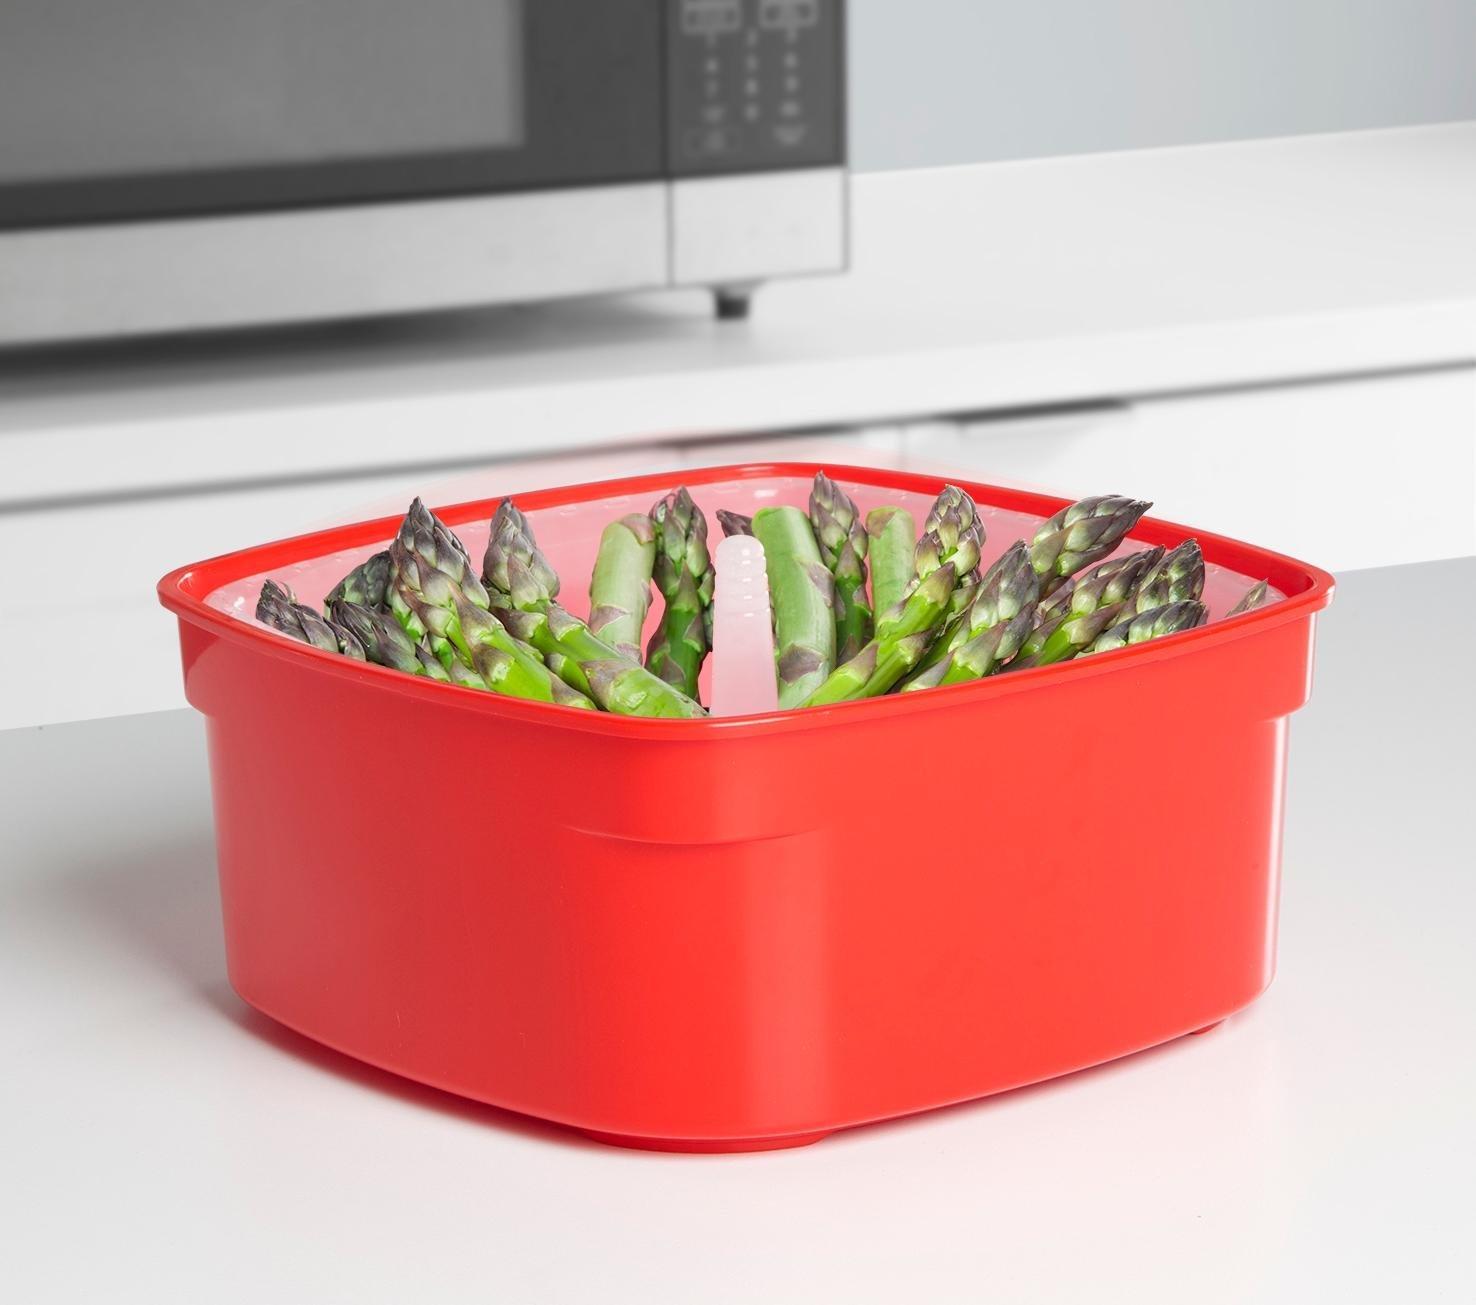 Sistema; Microwave Cookware; Microwave Steamer